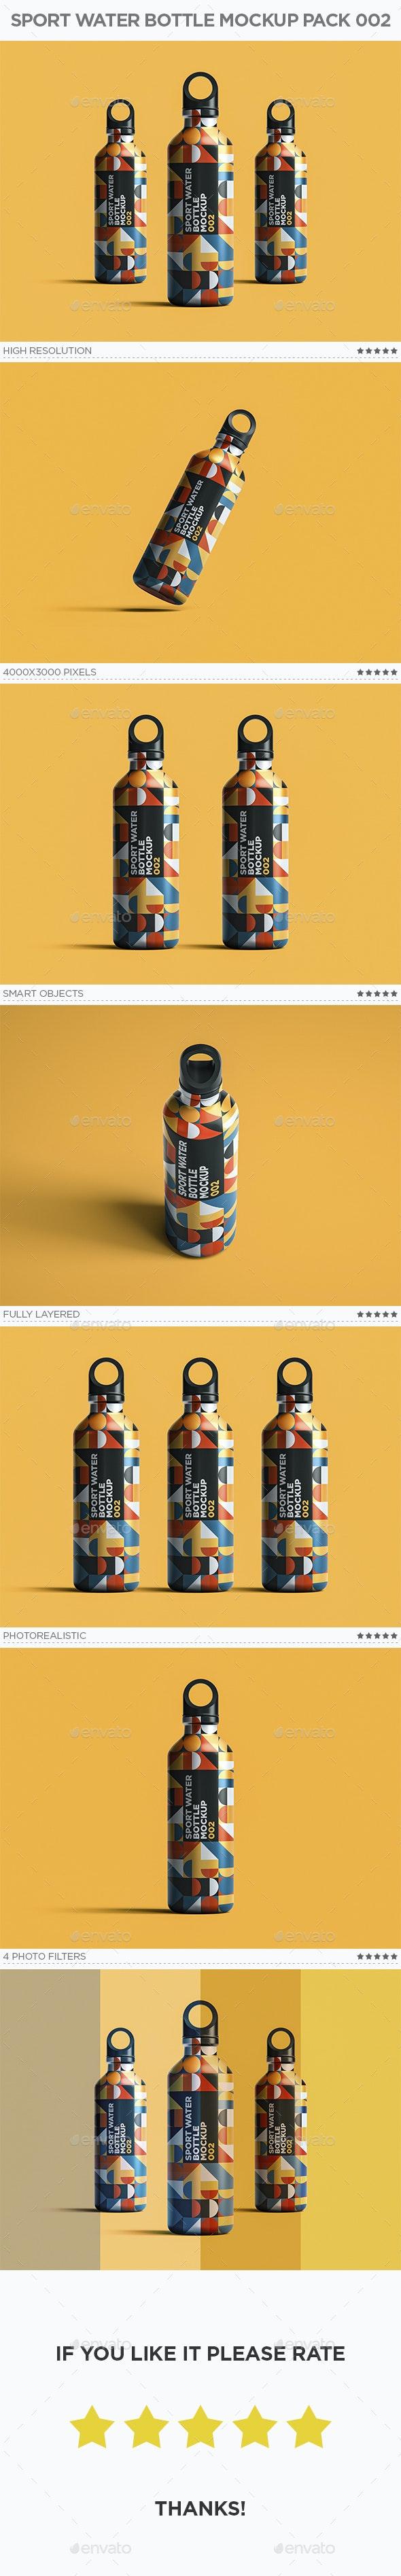 Sport Water Bottle Mockup Pack 002 - Food and Drink Packaging